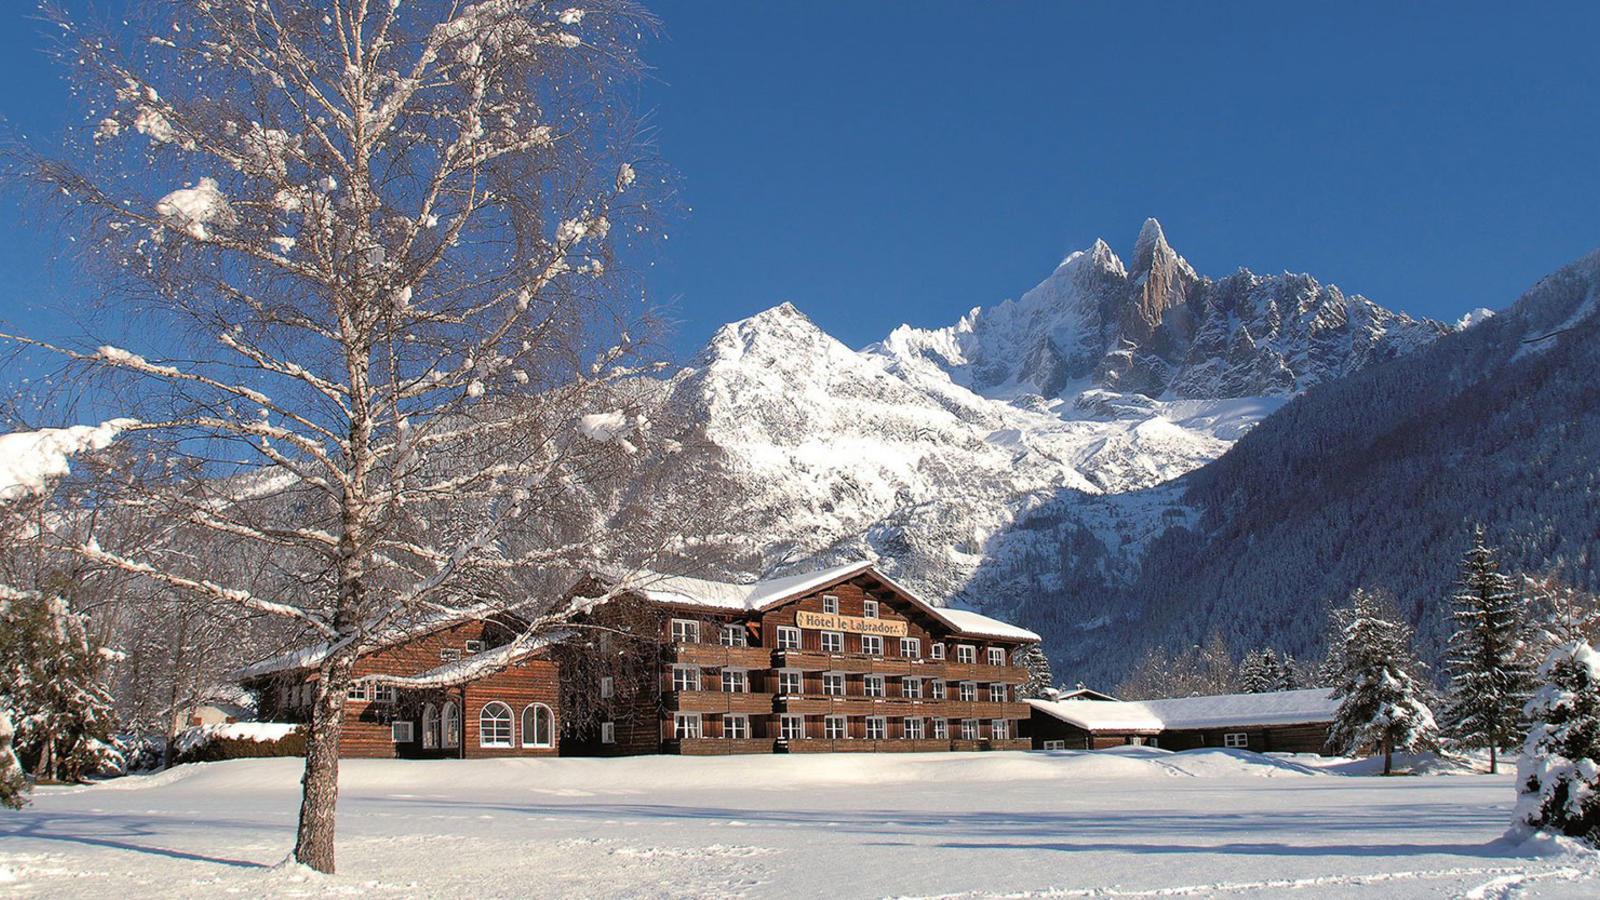 Hotel le labrador chamonix for Hotels chamonix